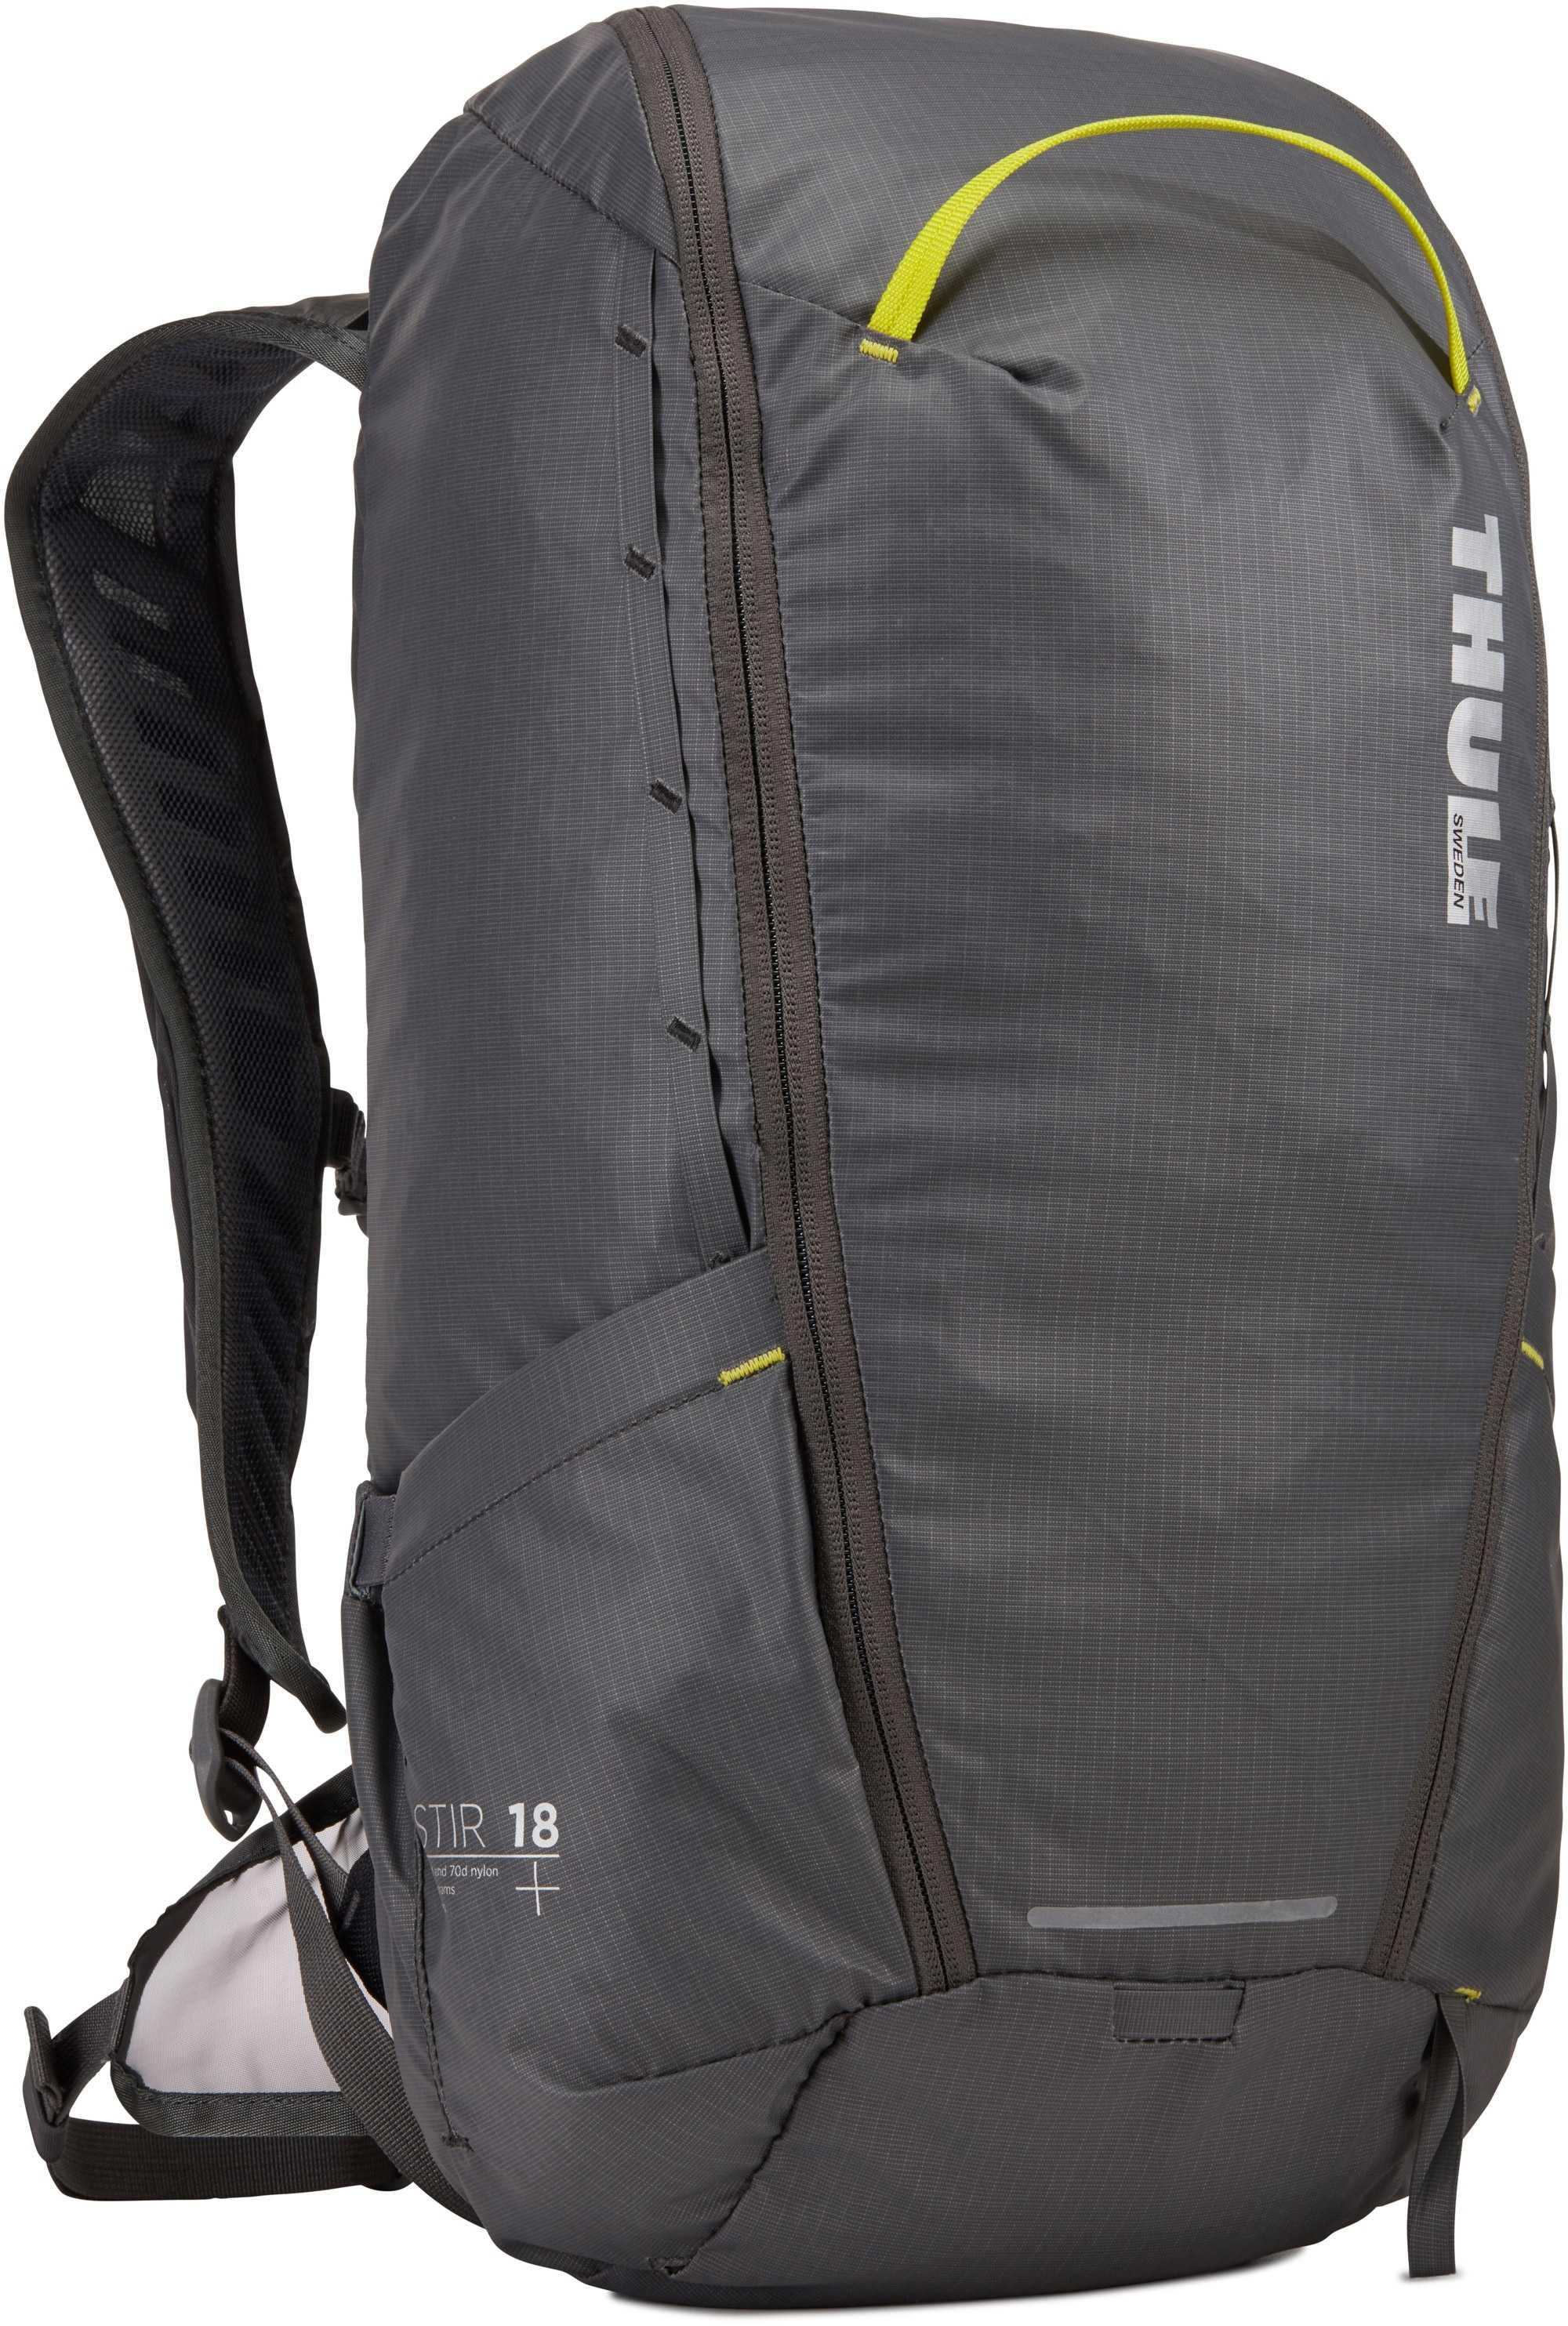 Rygsæk Thule Stir 18 l grå   Travel bags